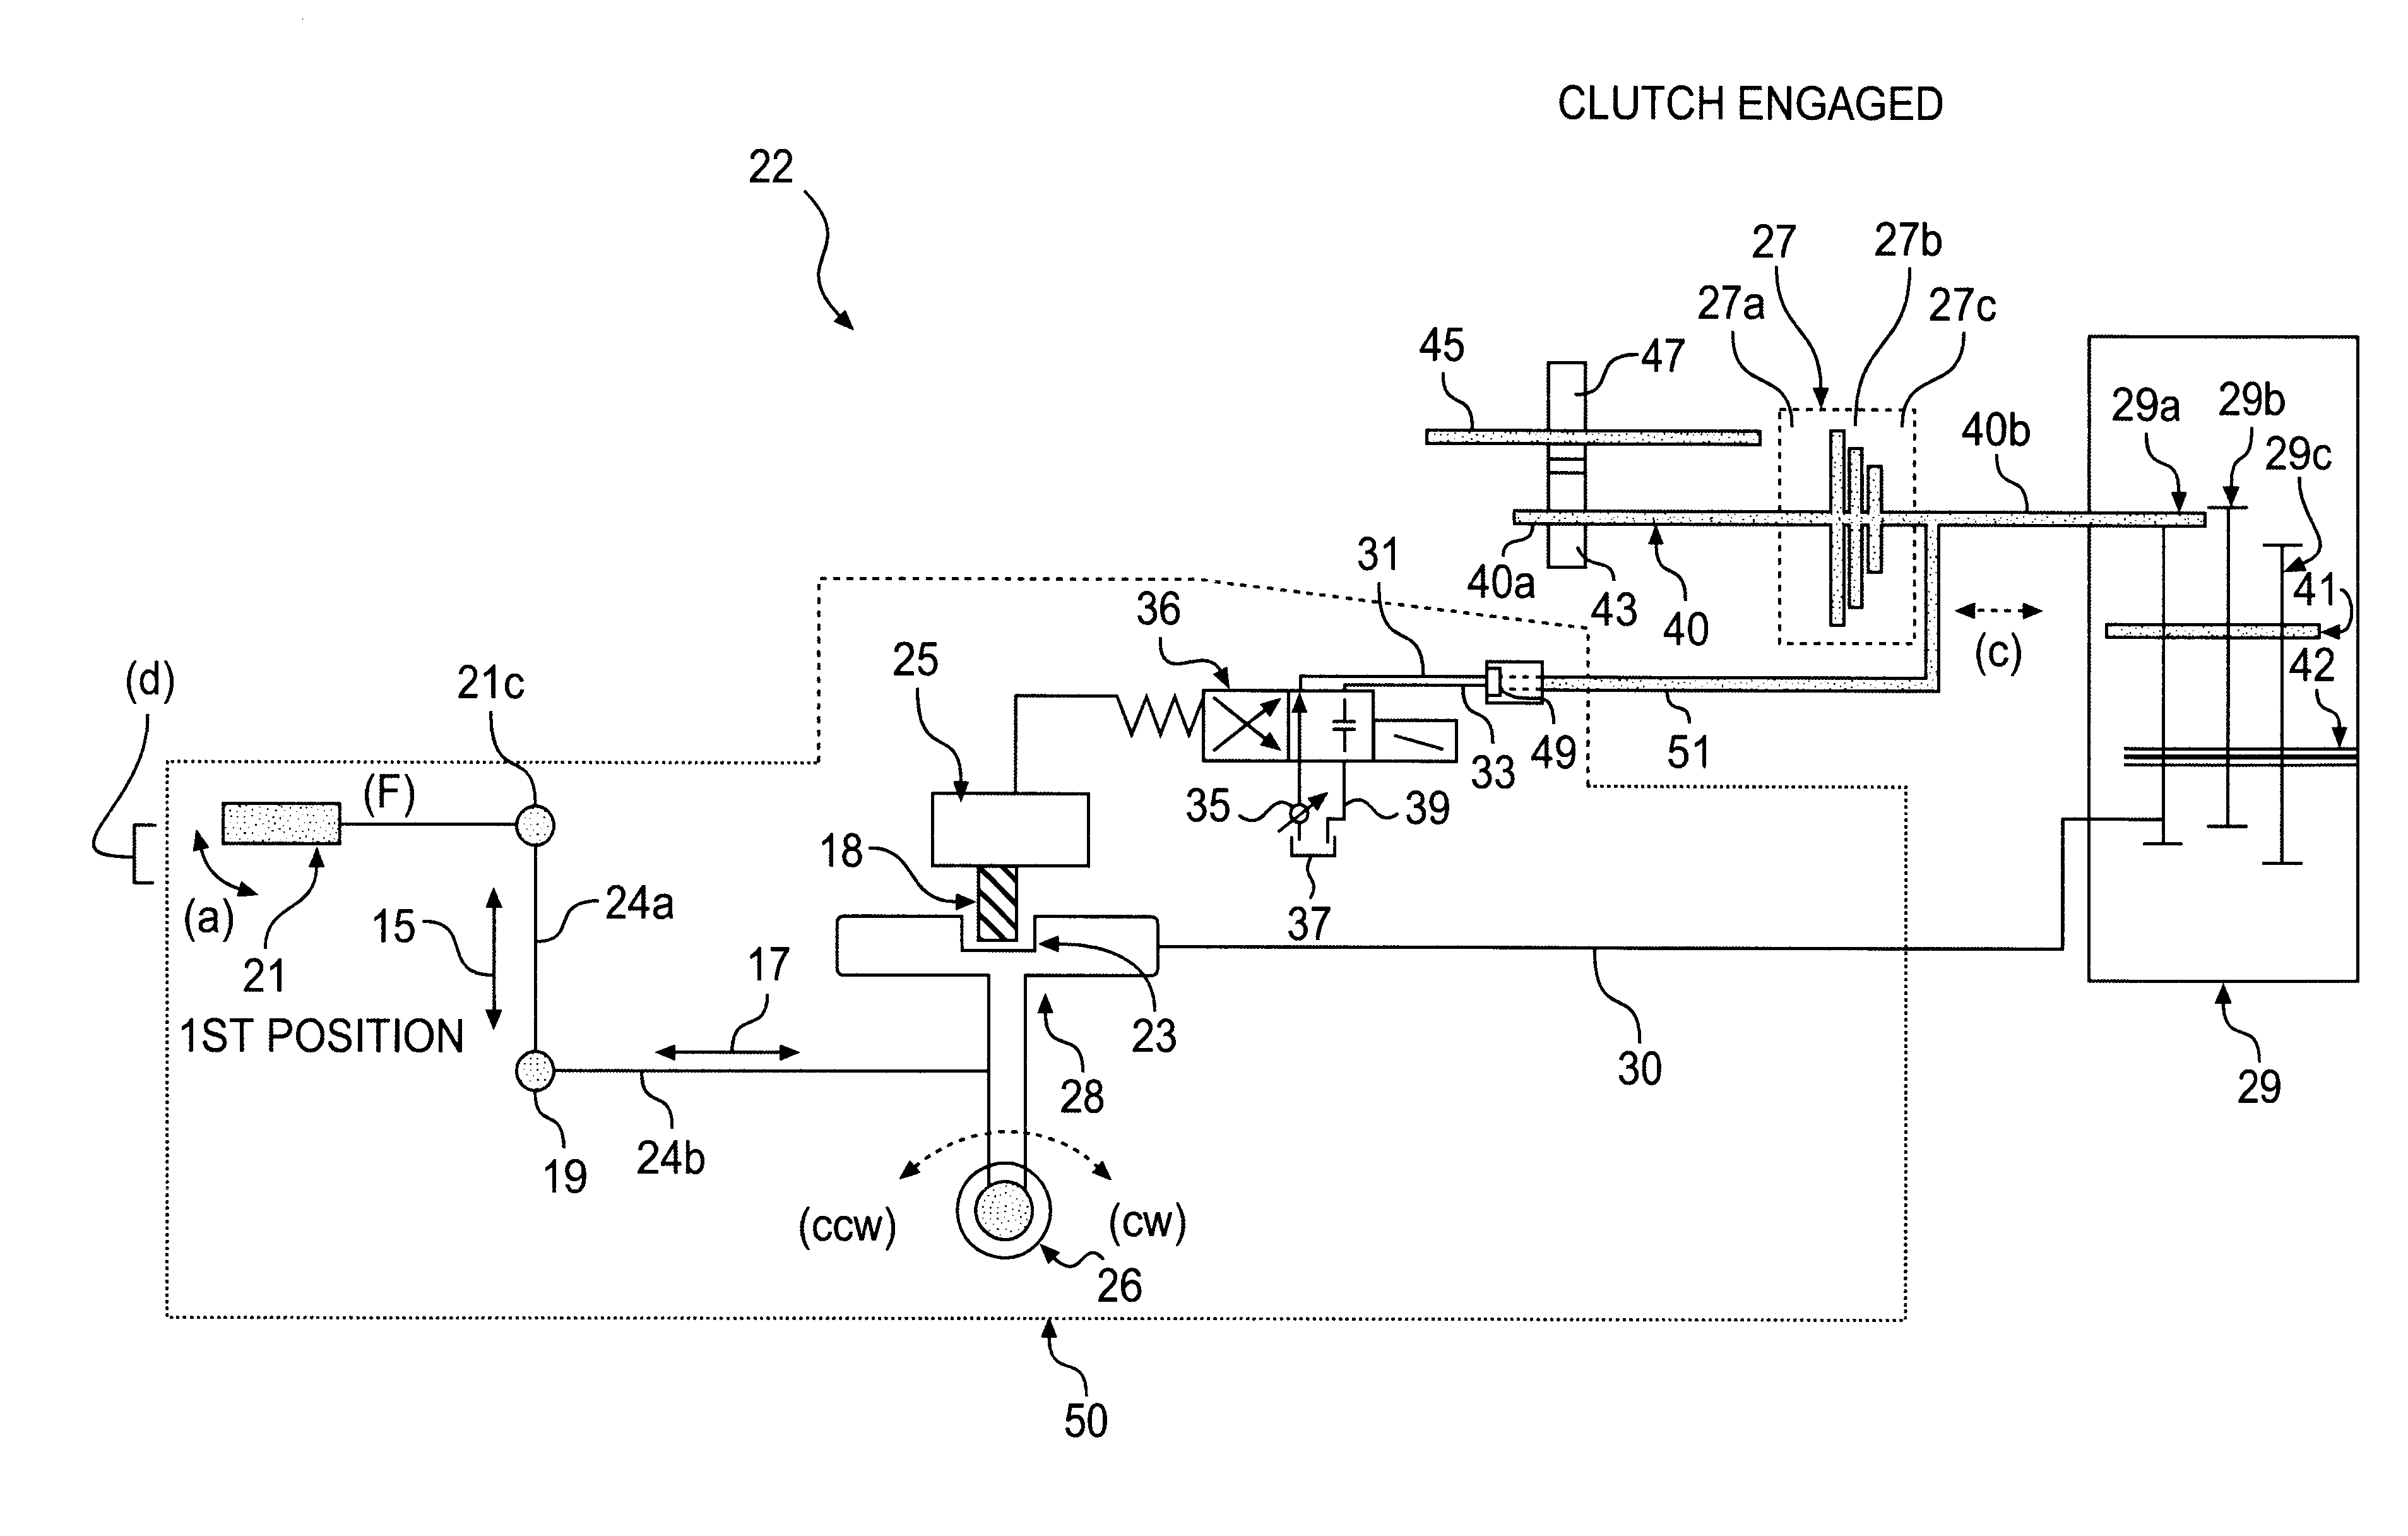 1988 b tracker wiring diagram tracker wiring colors wiring diagram Telephone Wiring Color Code  Marine Wiring Color Code Wire Connector Color Code Sony Car Stereo Wiring Diagram